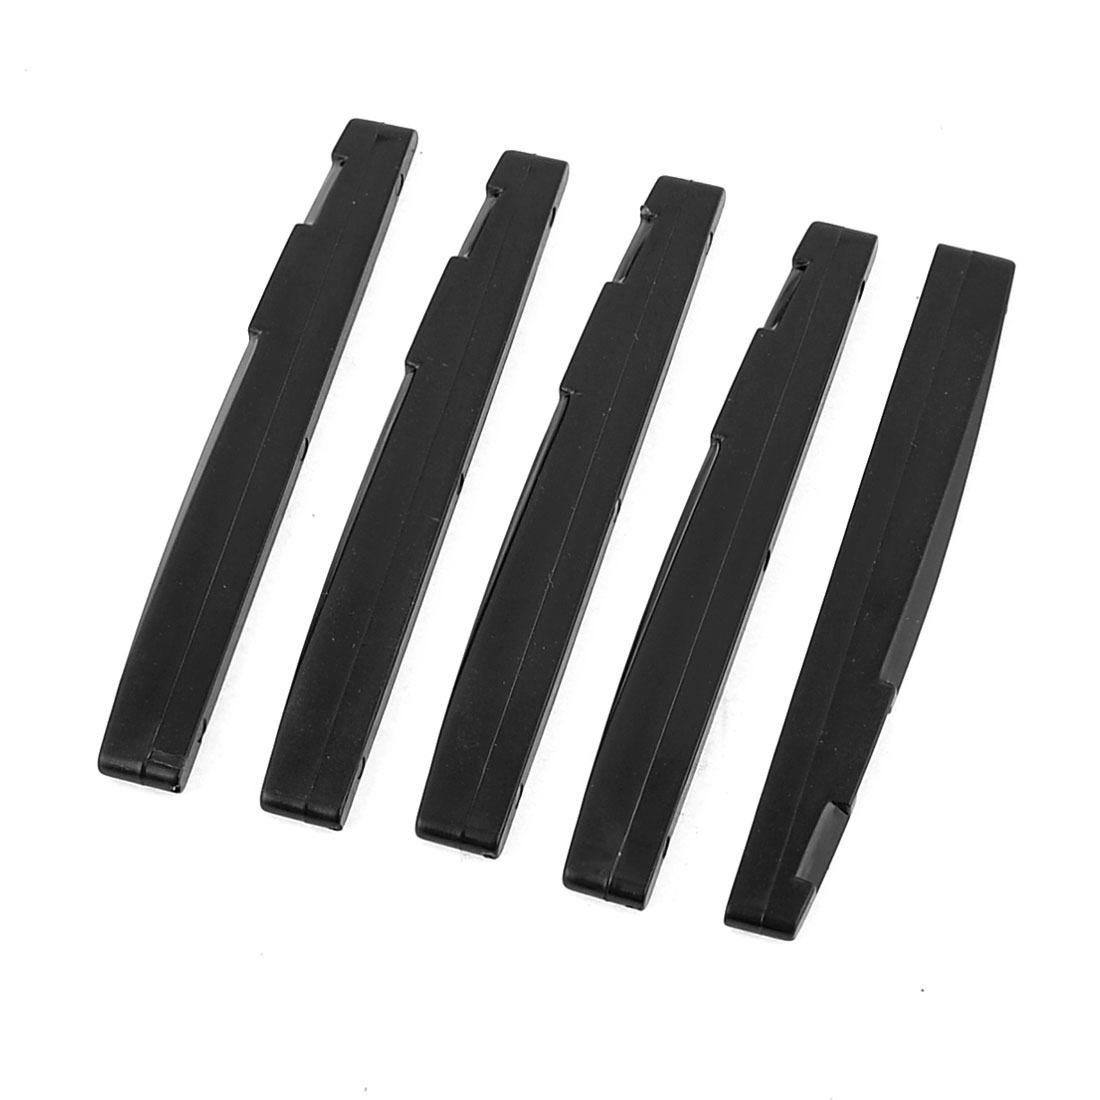 3 Pieces Black Bridge Saddle Nut Replacement for Classical Guitar